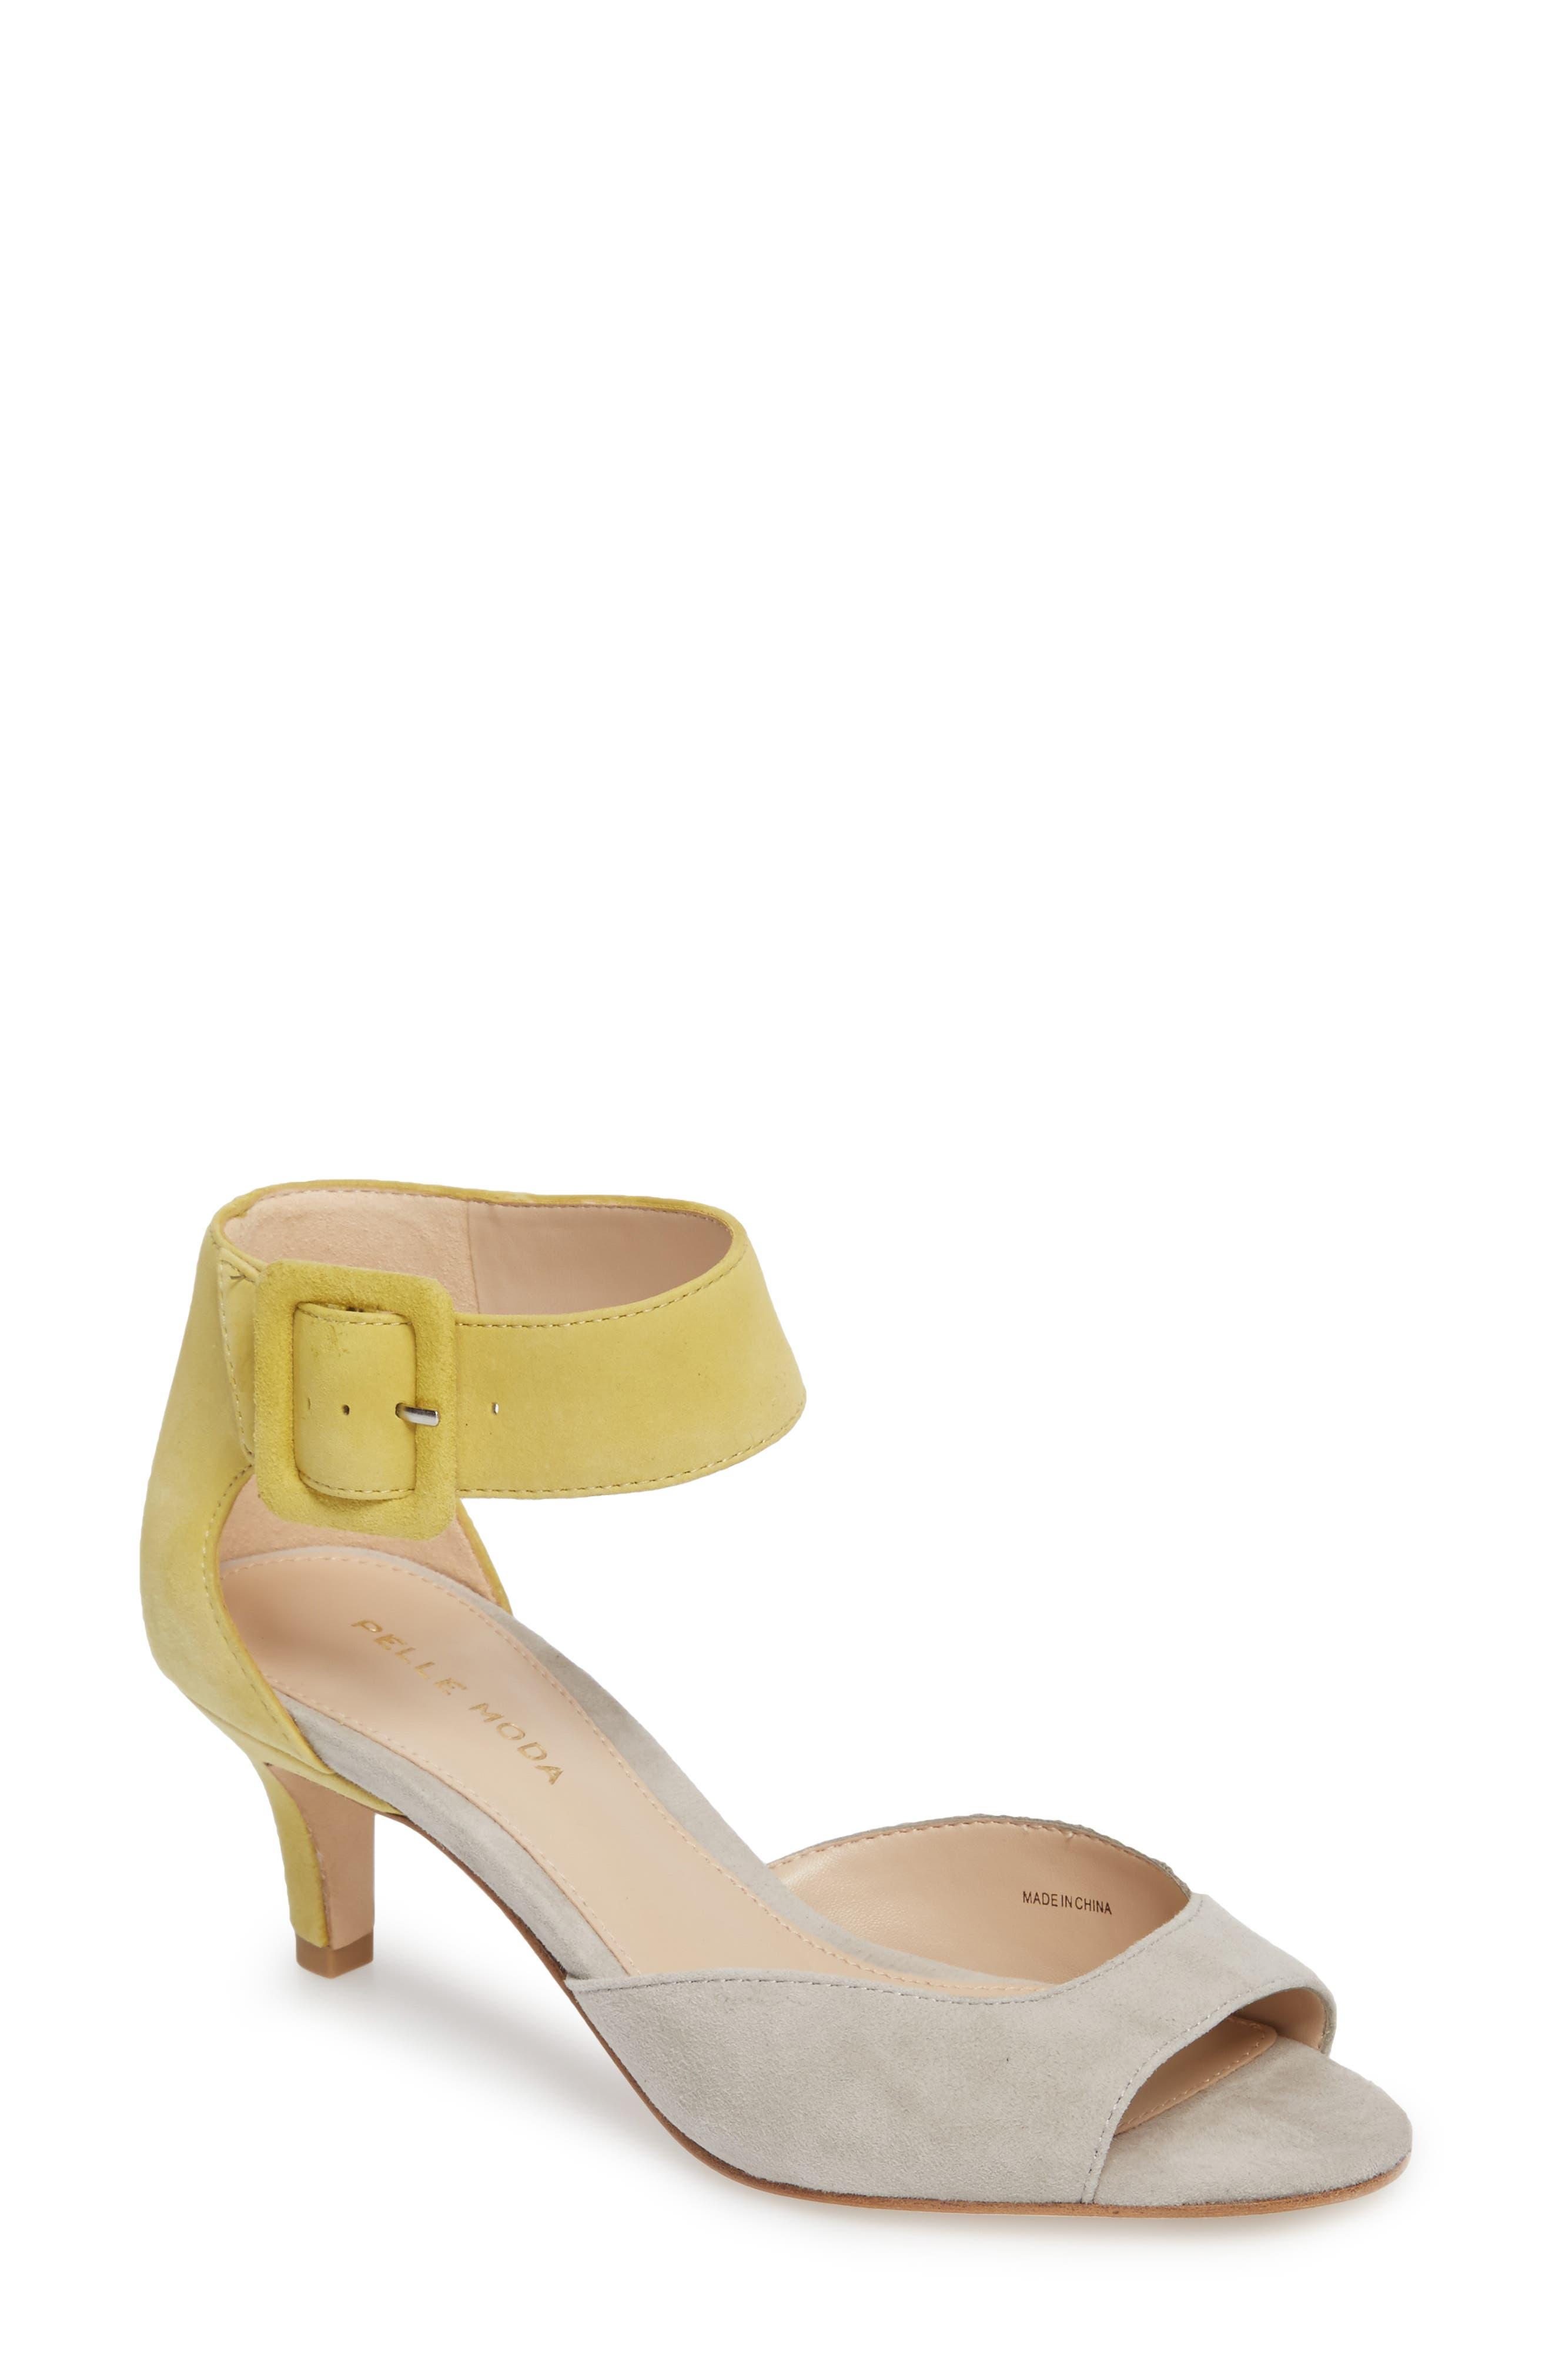 'Berlin' Ankle Strap Sandal,                         Main,                         color,